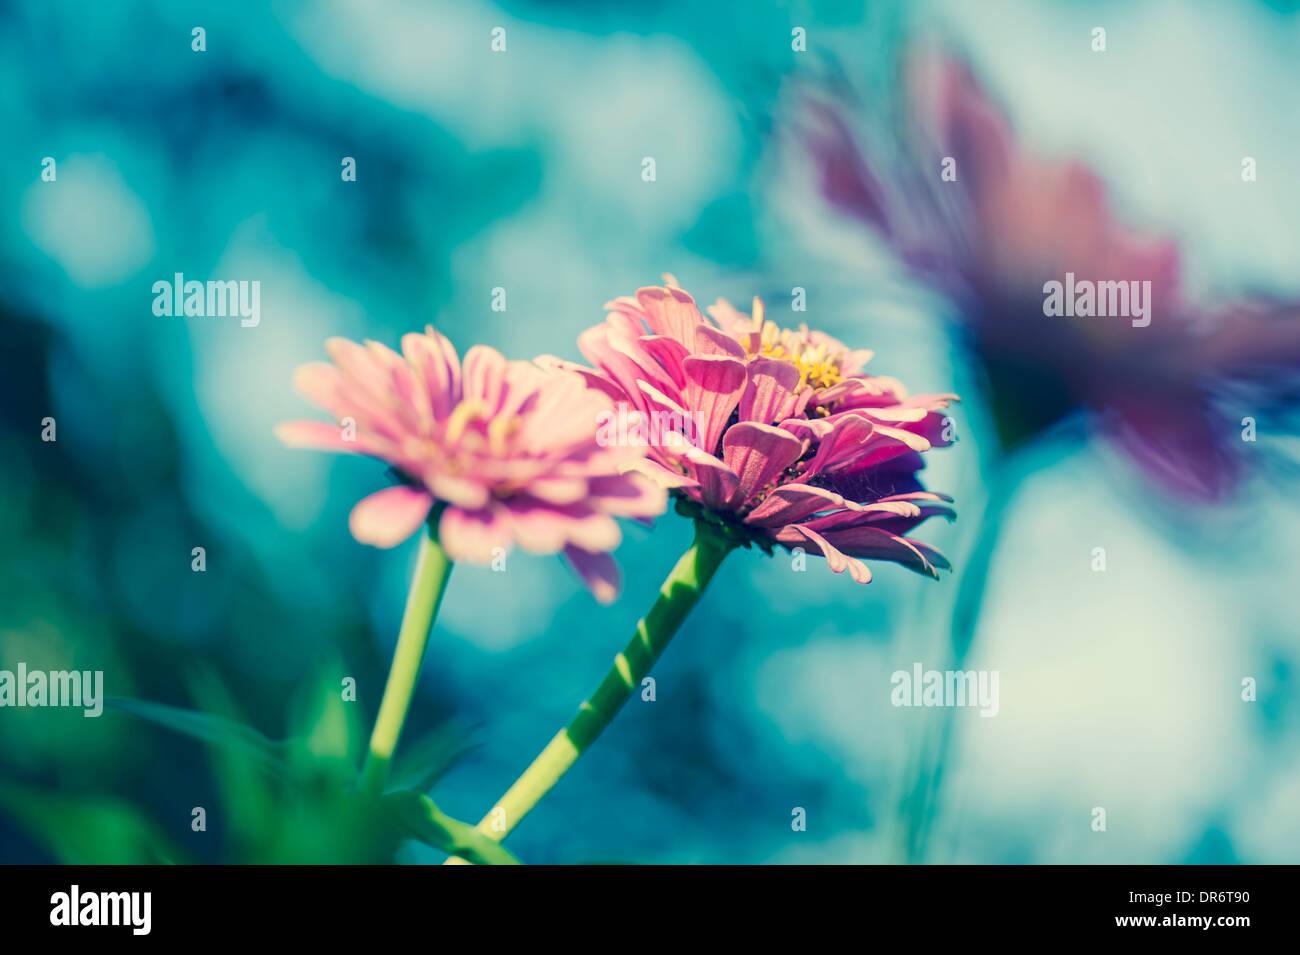 Trois fleurs de zinnia (Asteroideae commun) Photo Stock